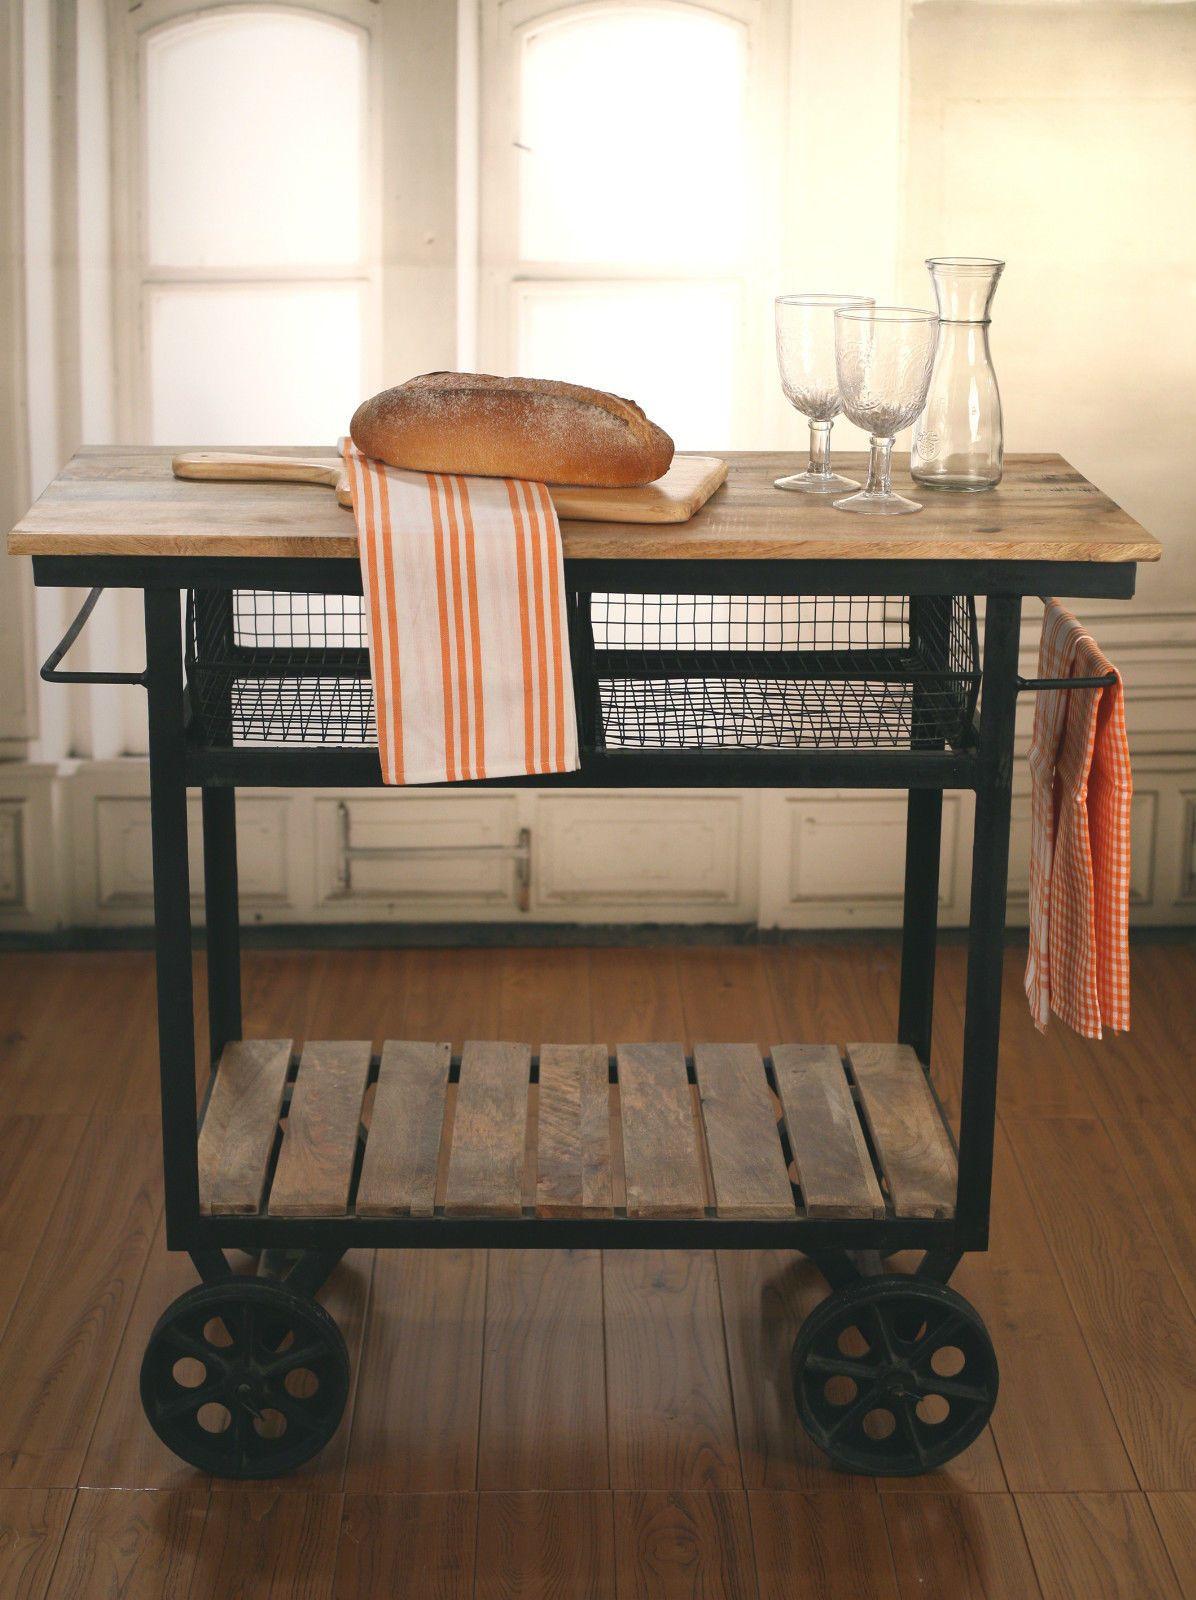 Industrial Style Kitchen Trolley Kitchen Island On Metal Wheels